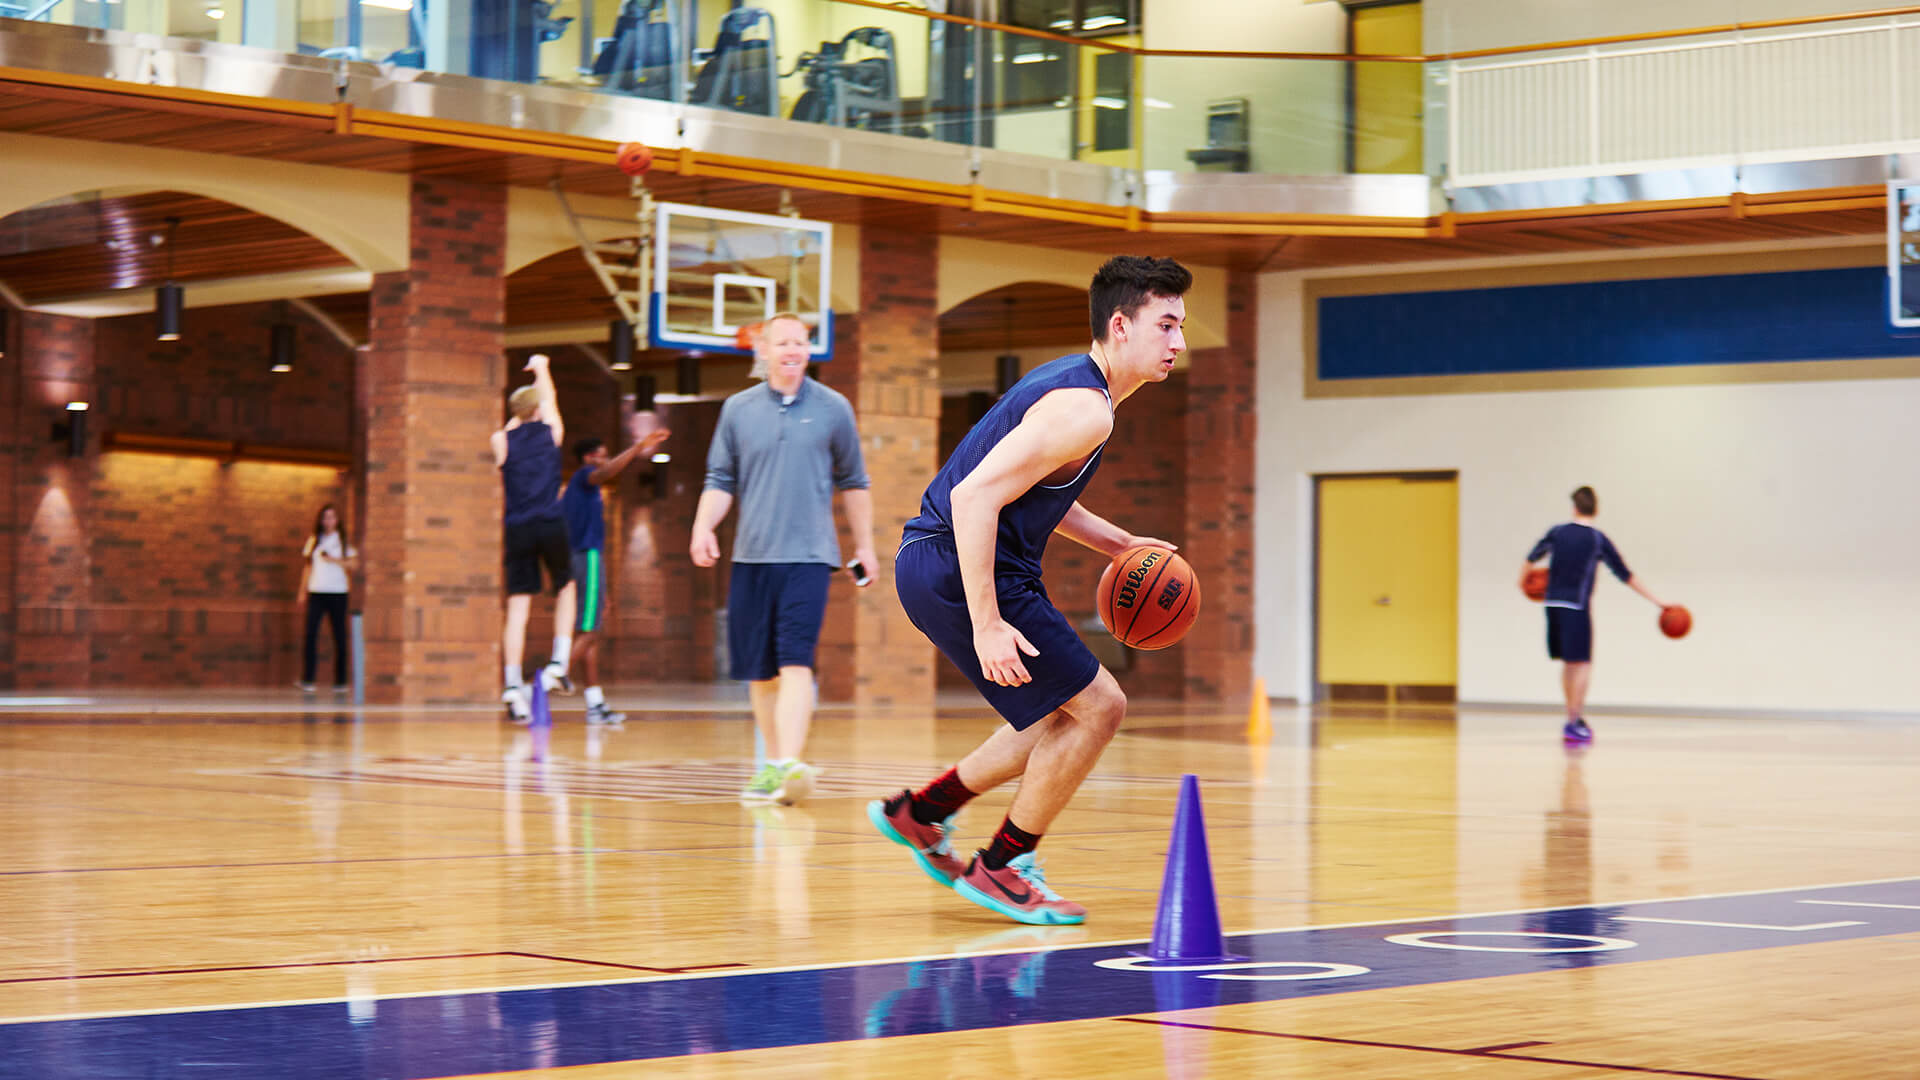 male students playing basketball